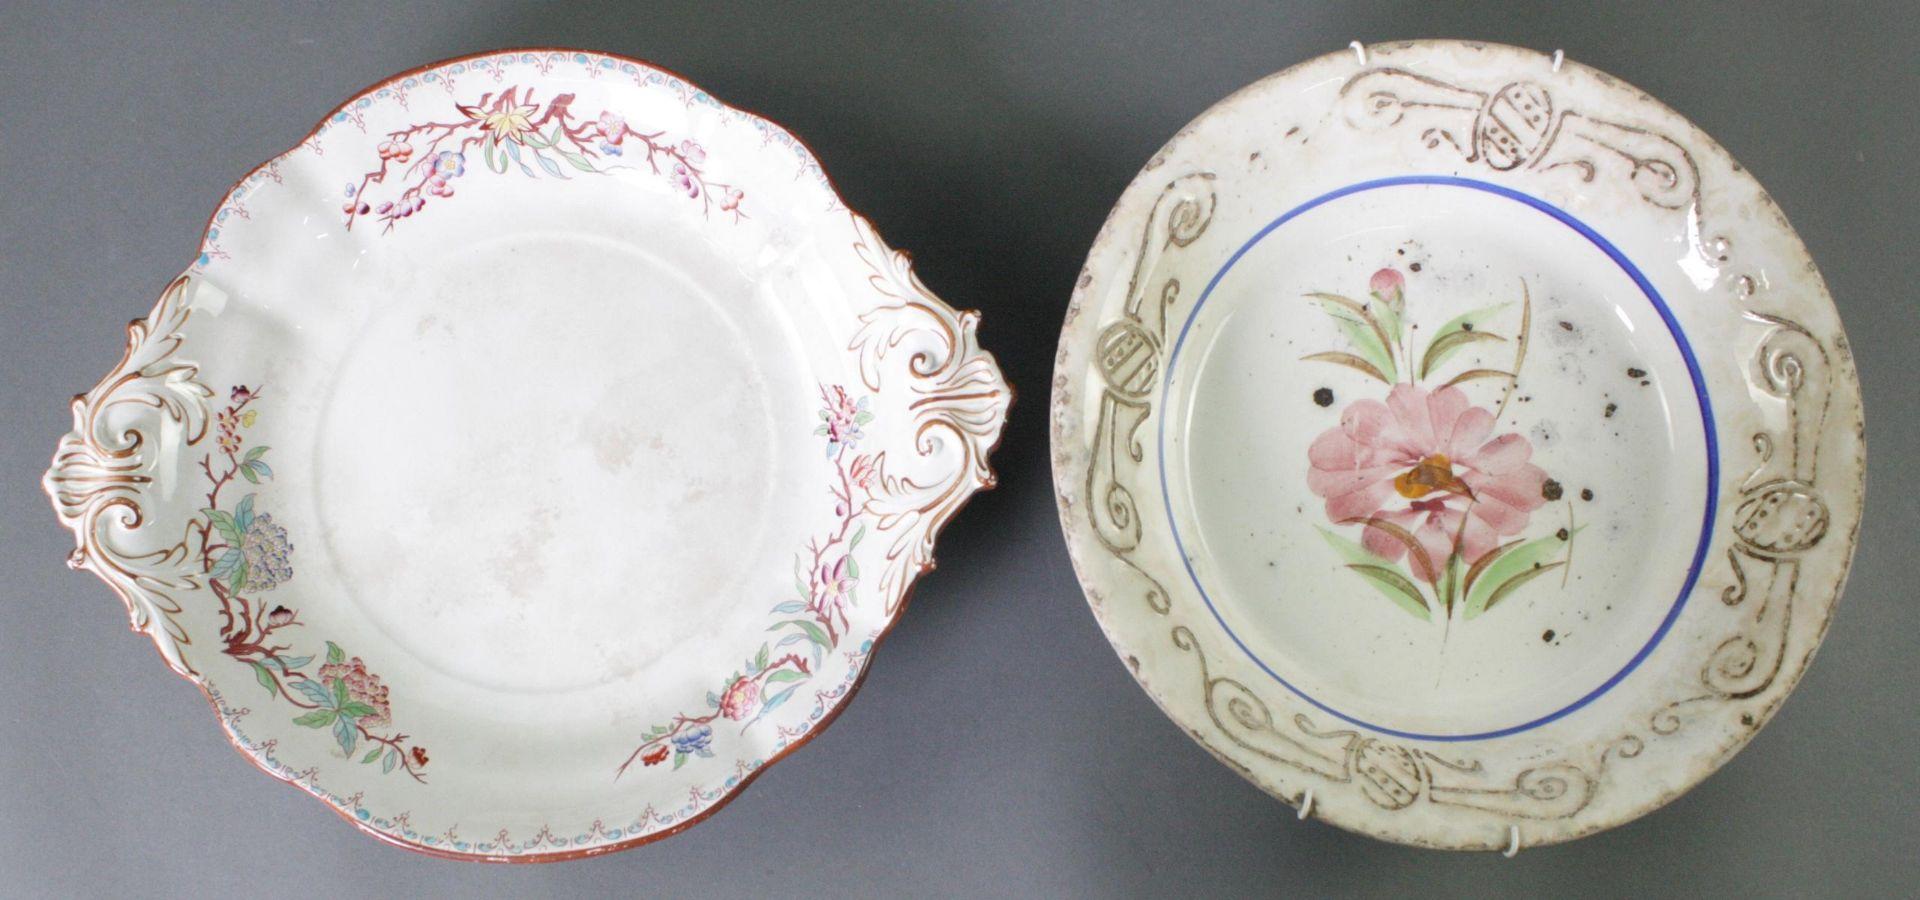 2 Keramikschalen 19. Jahrhundert